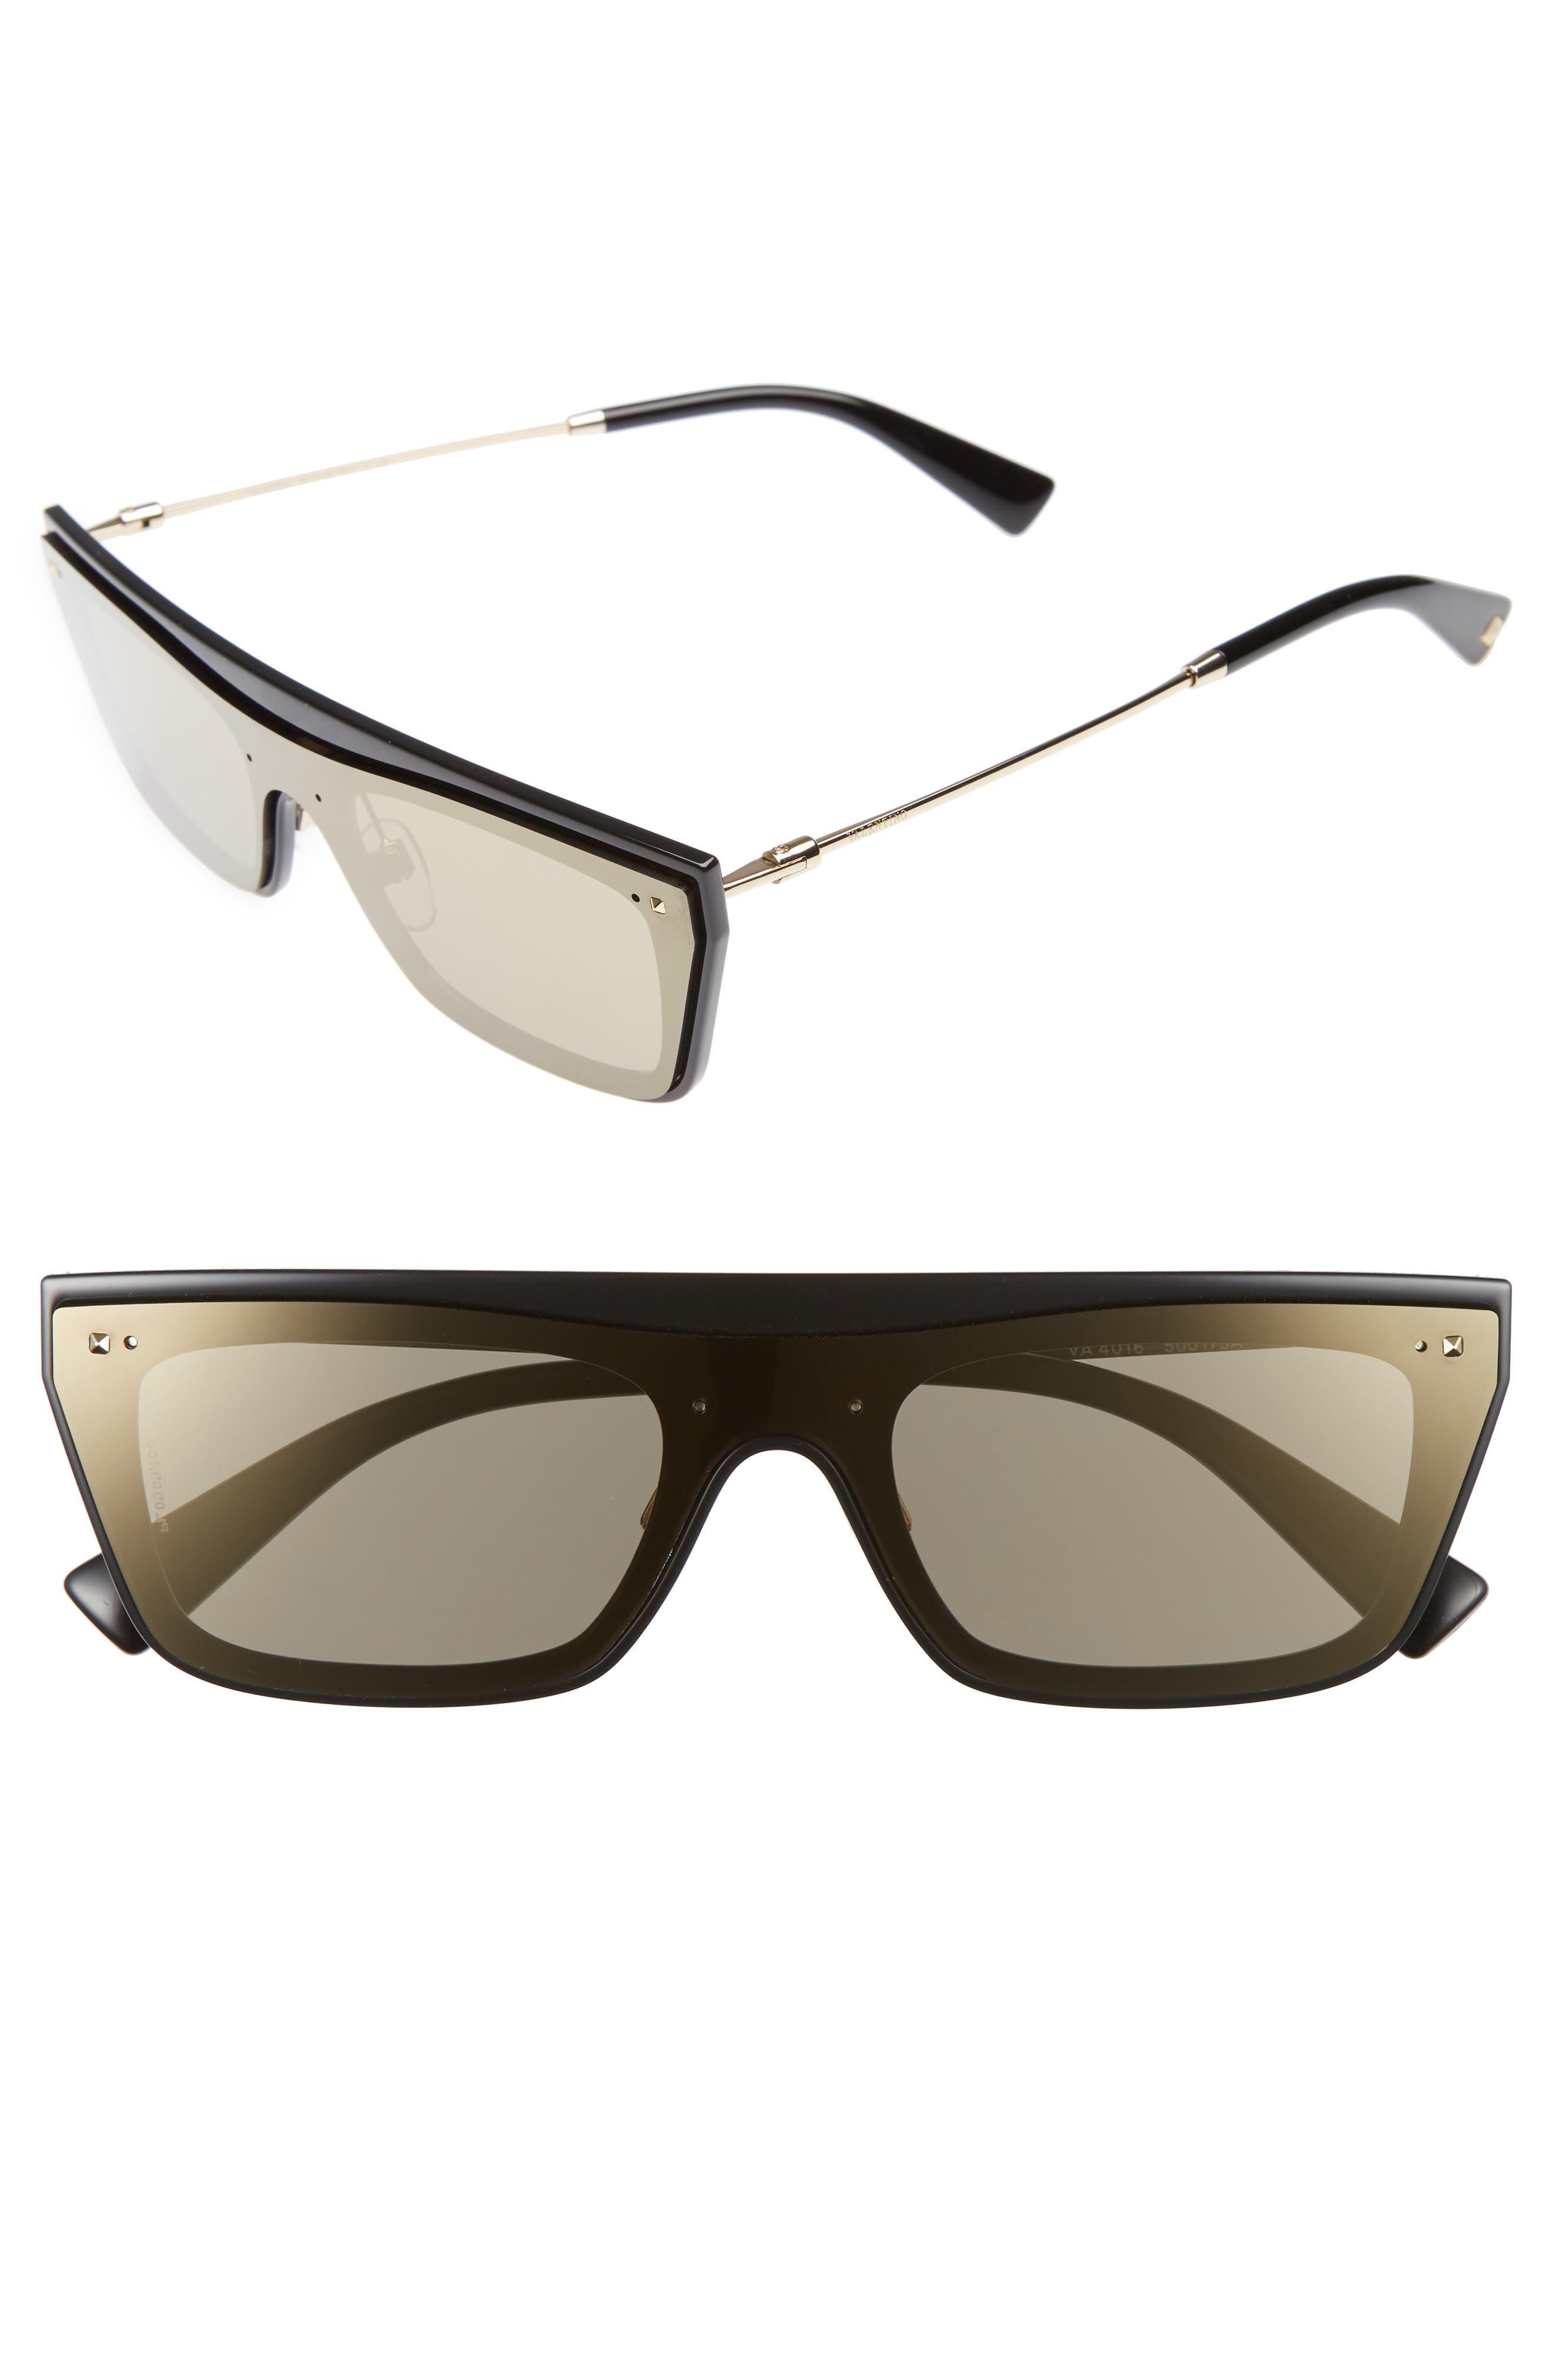 Alternate Image 1 Selected - Valentino Rockstud 50mm Rectangular Sunglasses